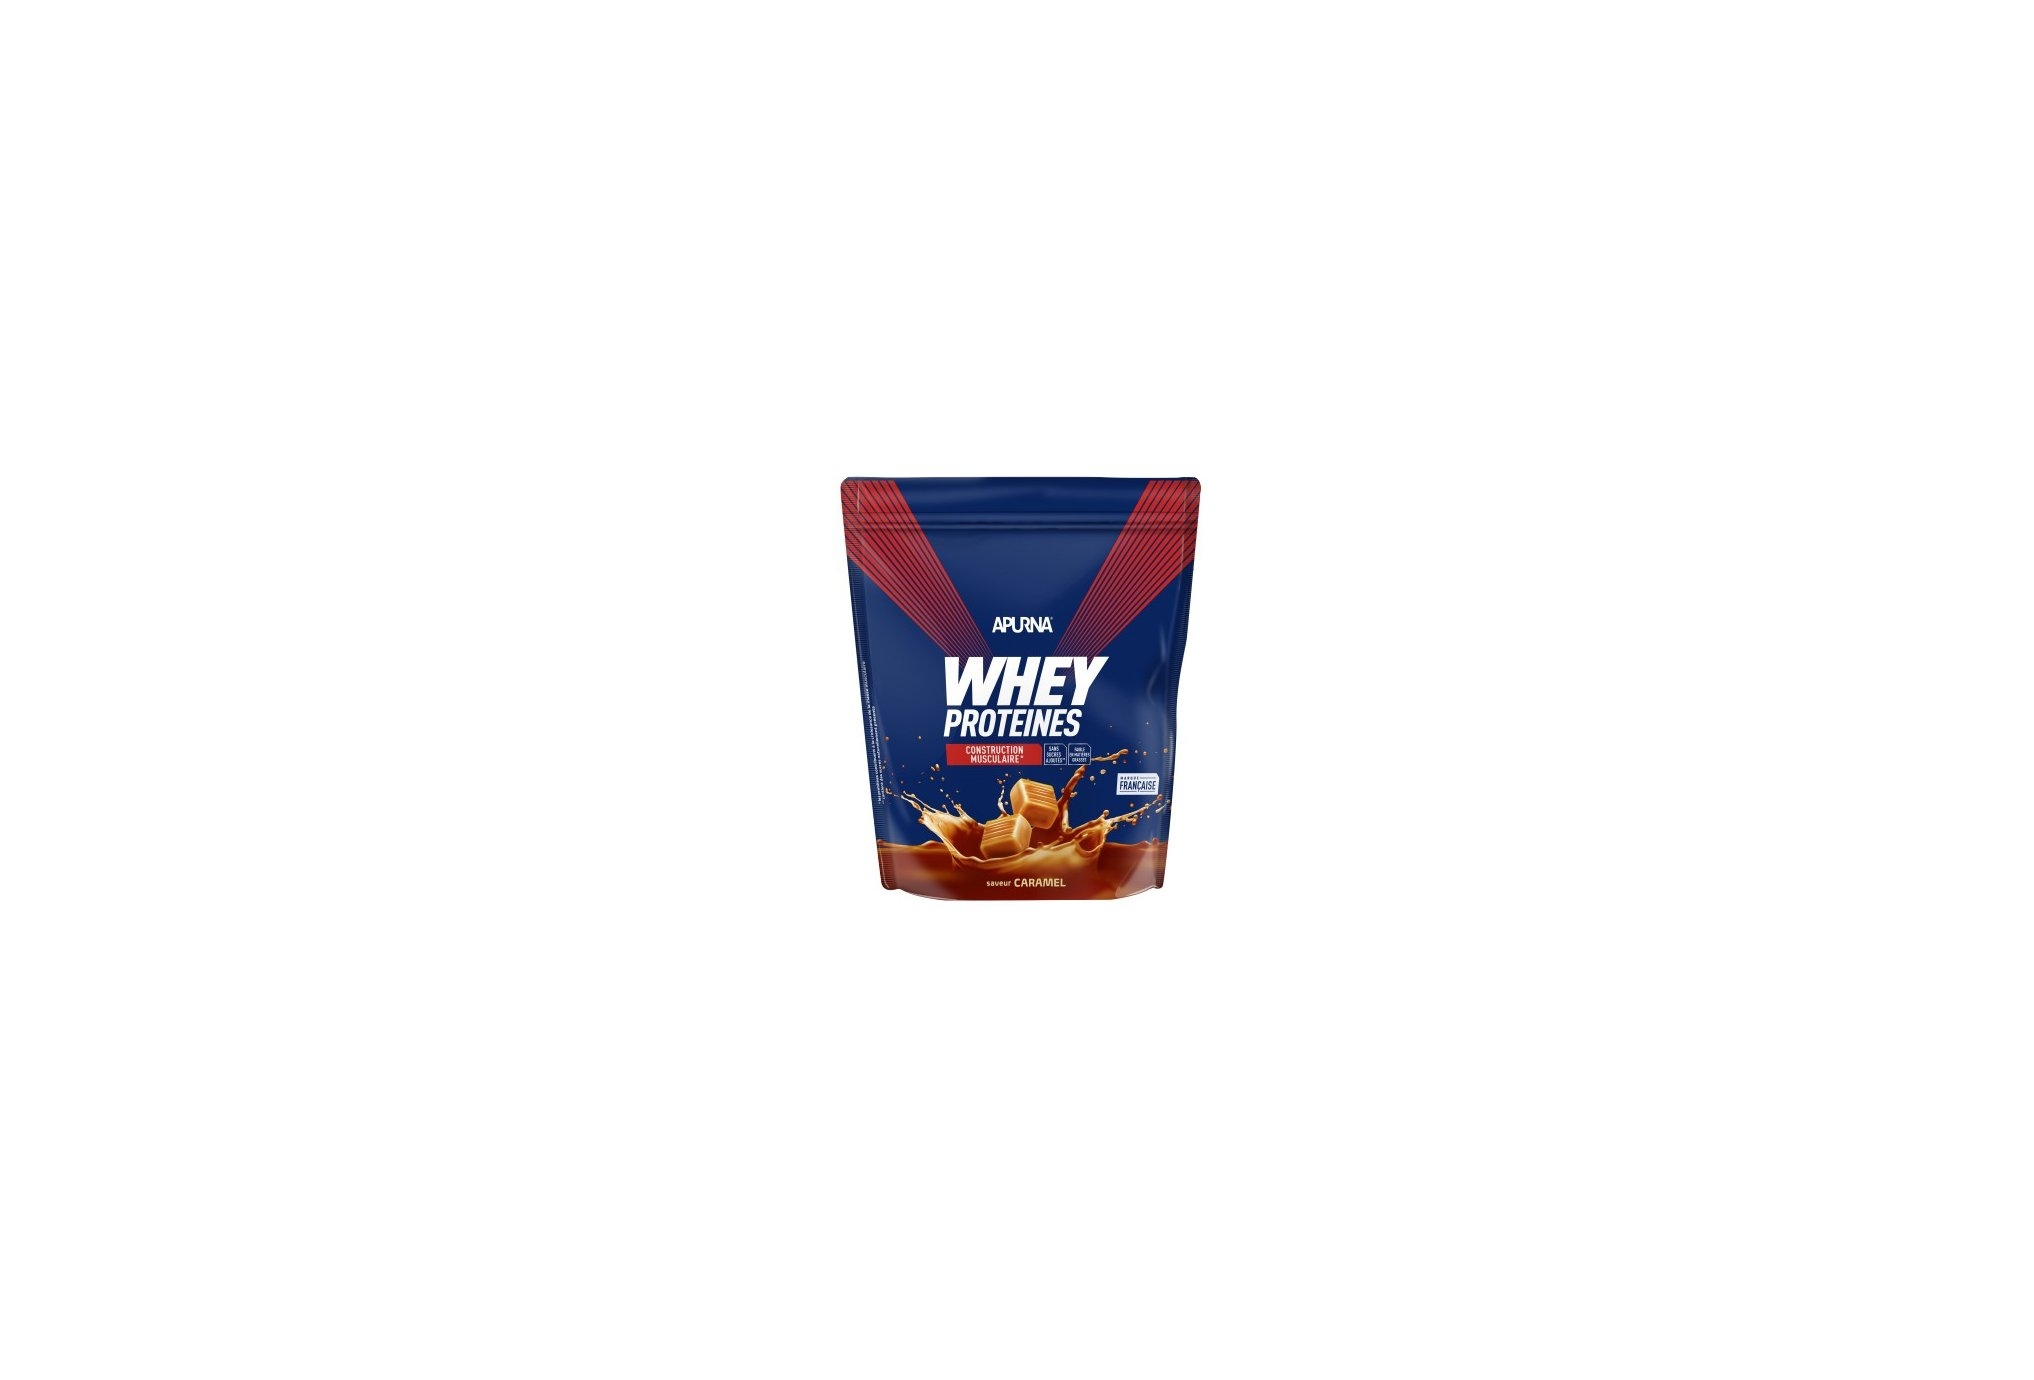 Apurna Whey protéines Caramel - 720 g Diététique Protéines / récupération